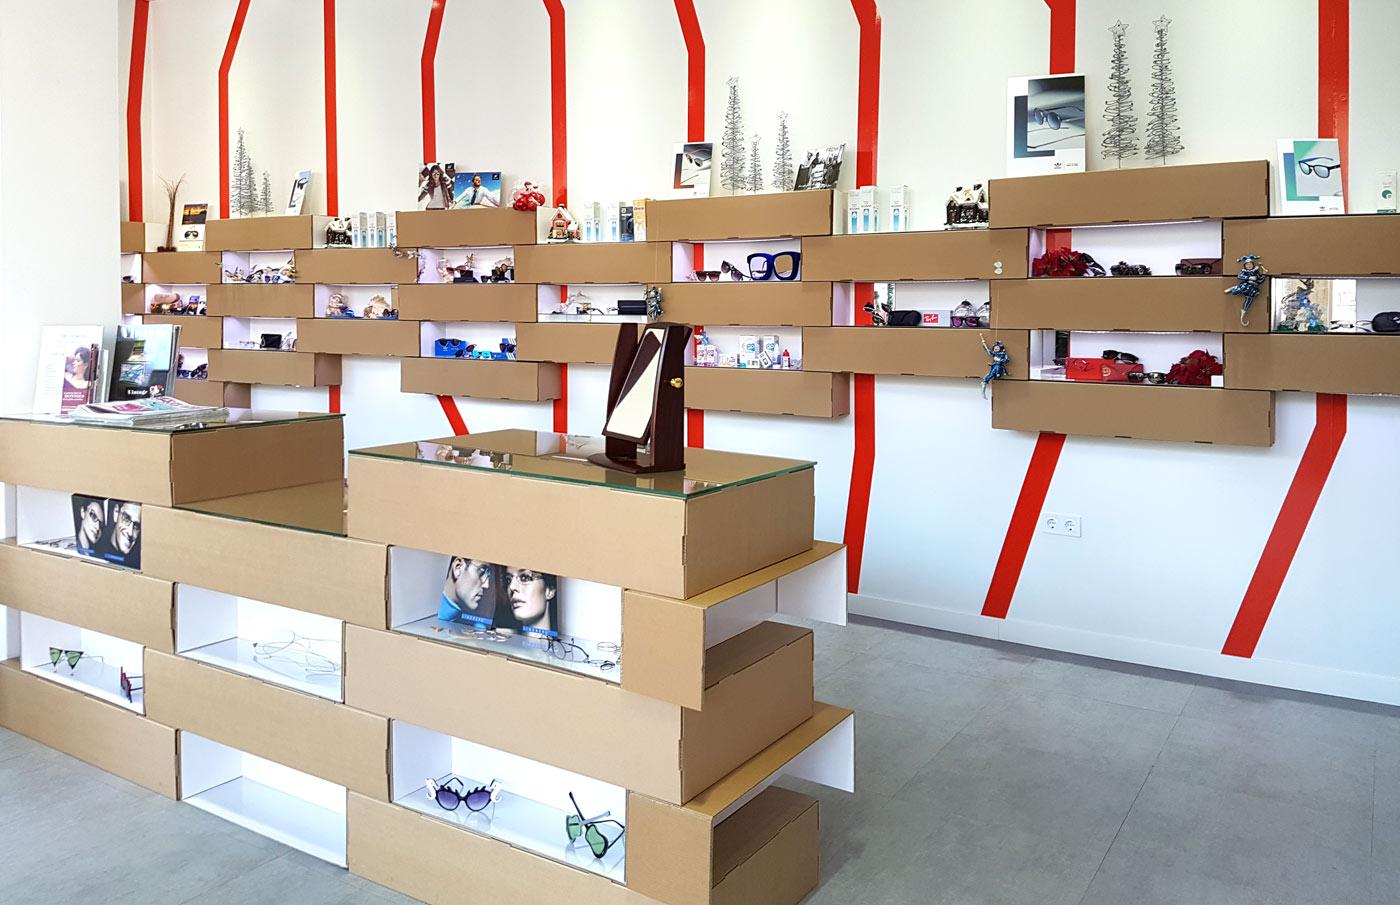 expositores para gafas carton optica almeria mostrador estantes baldas cartonlab diseño interior retail